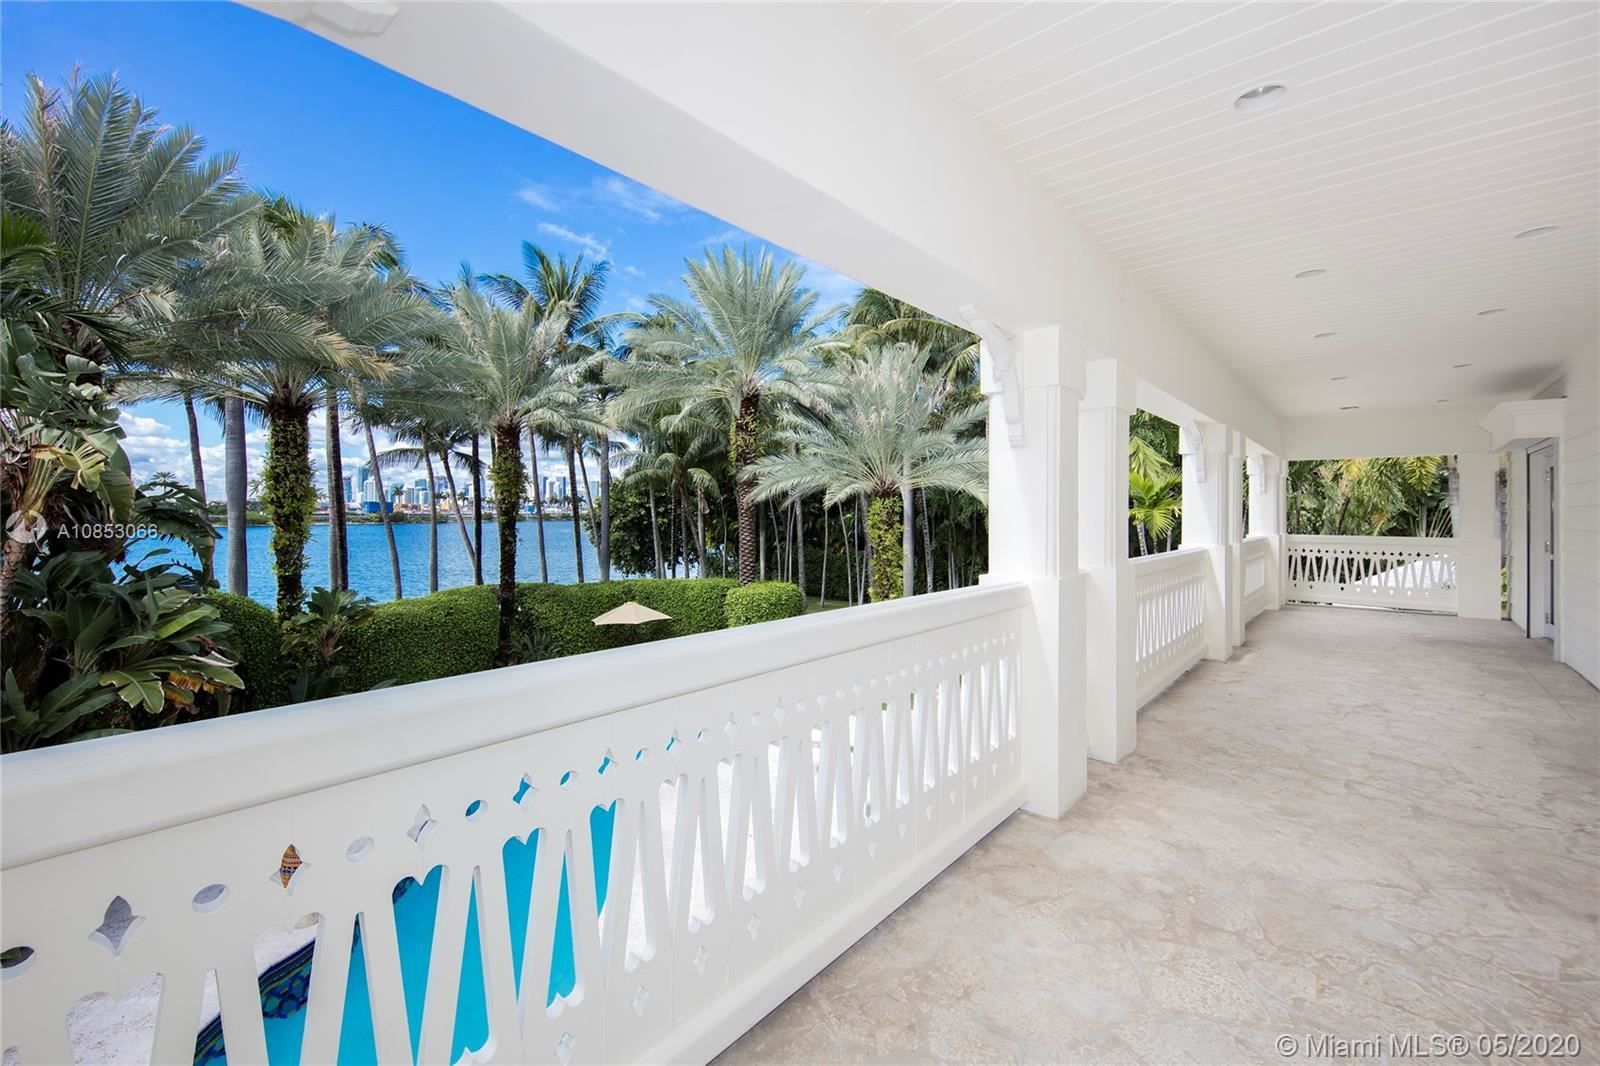 Photo 14 of Listing MLS a10853066 in 1 Star Island Dr Miami Beach FL 33139